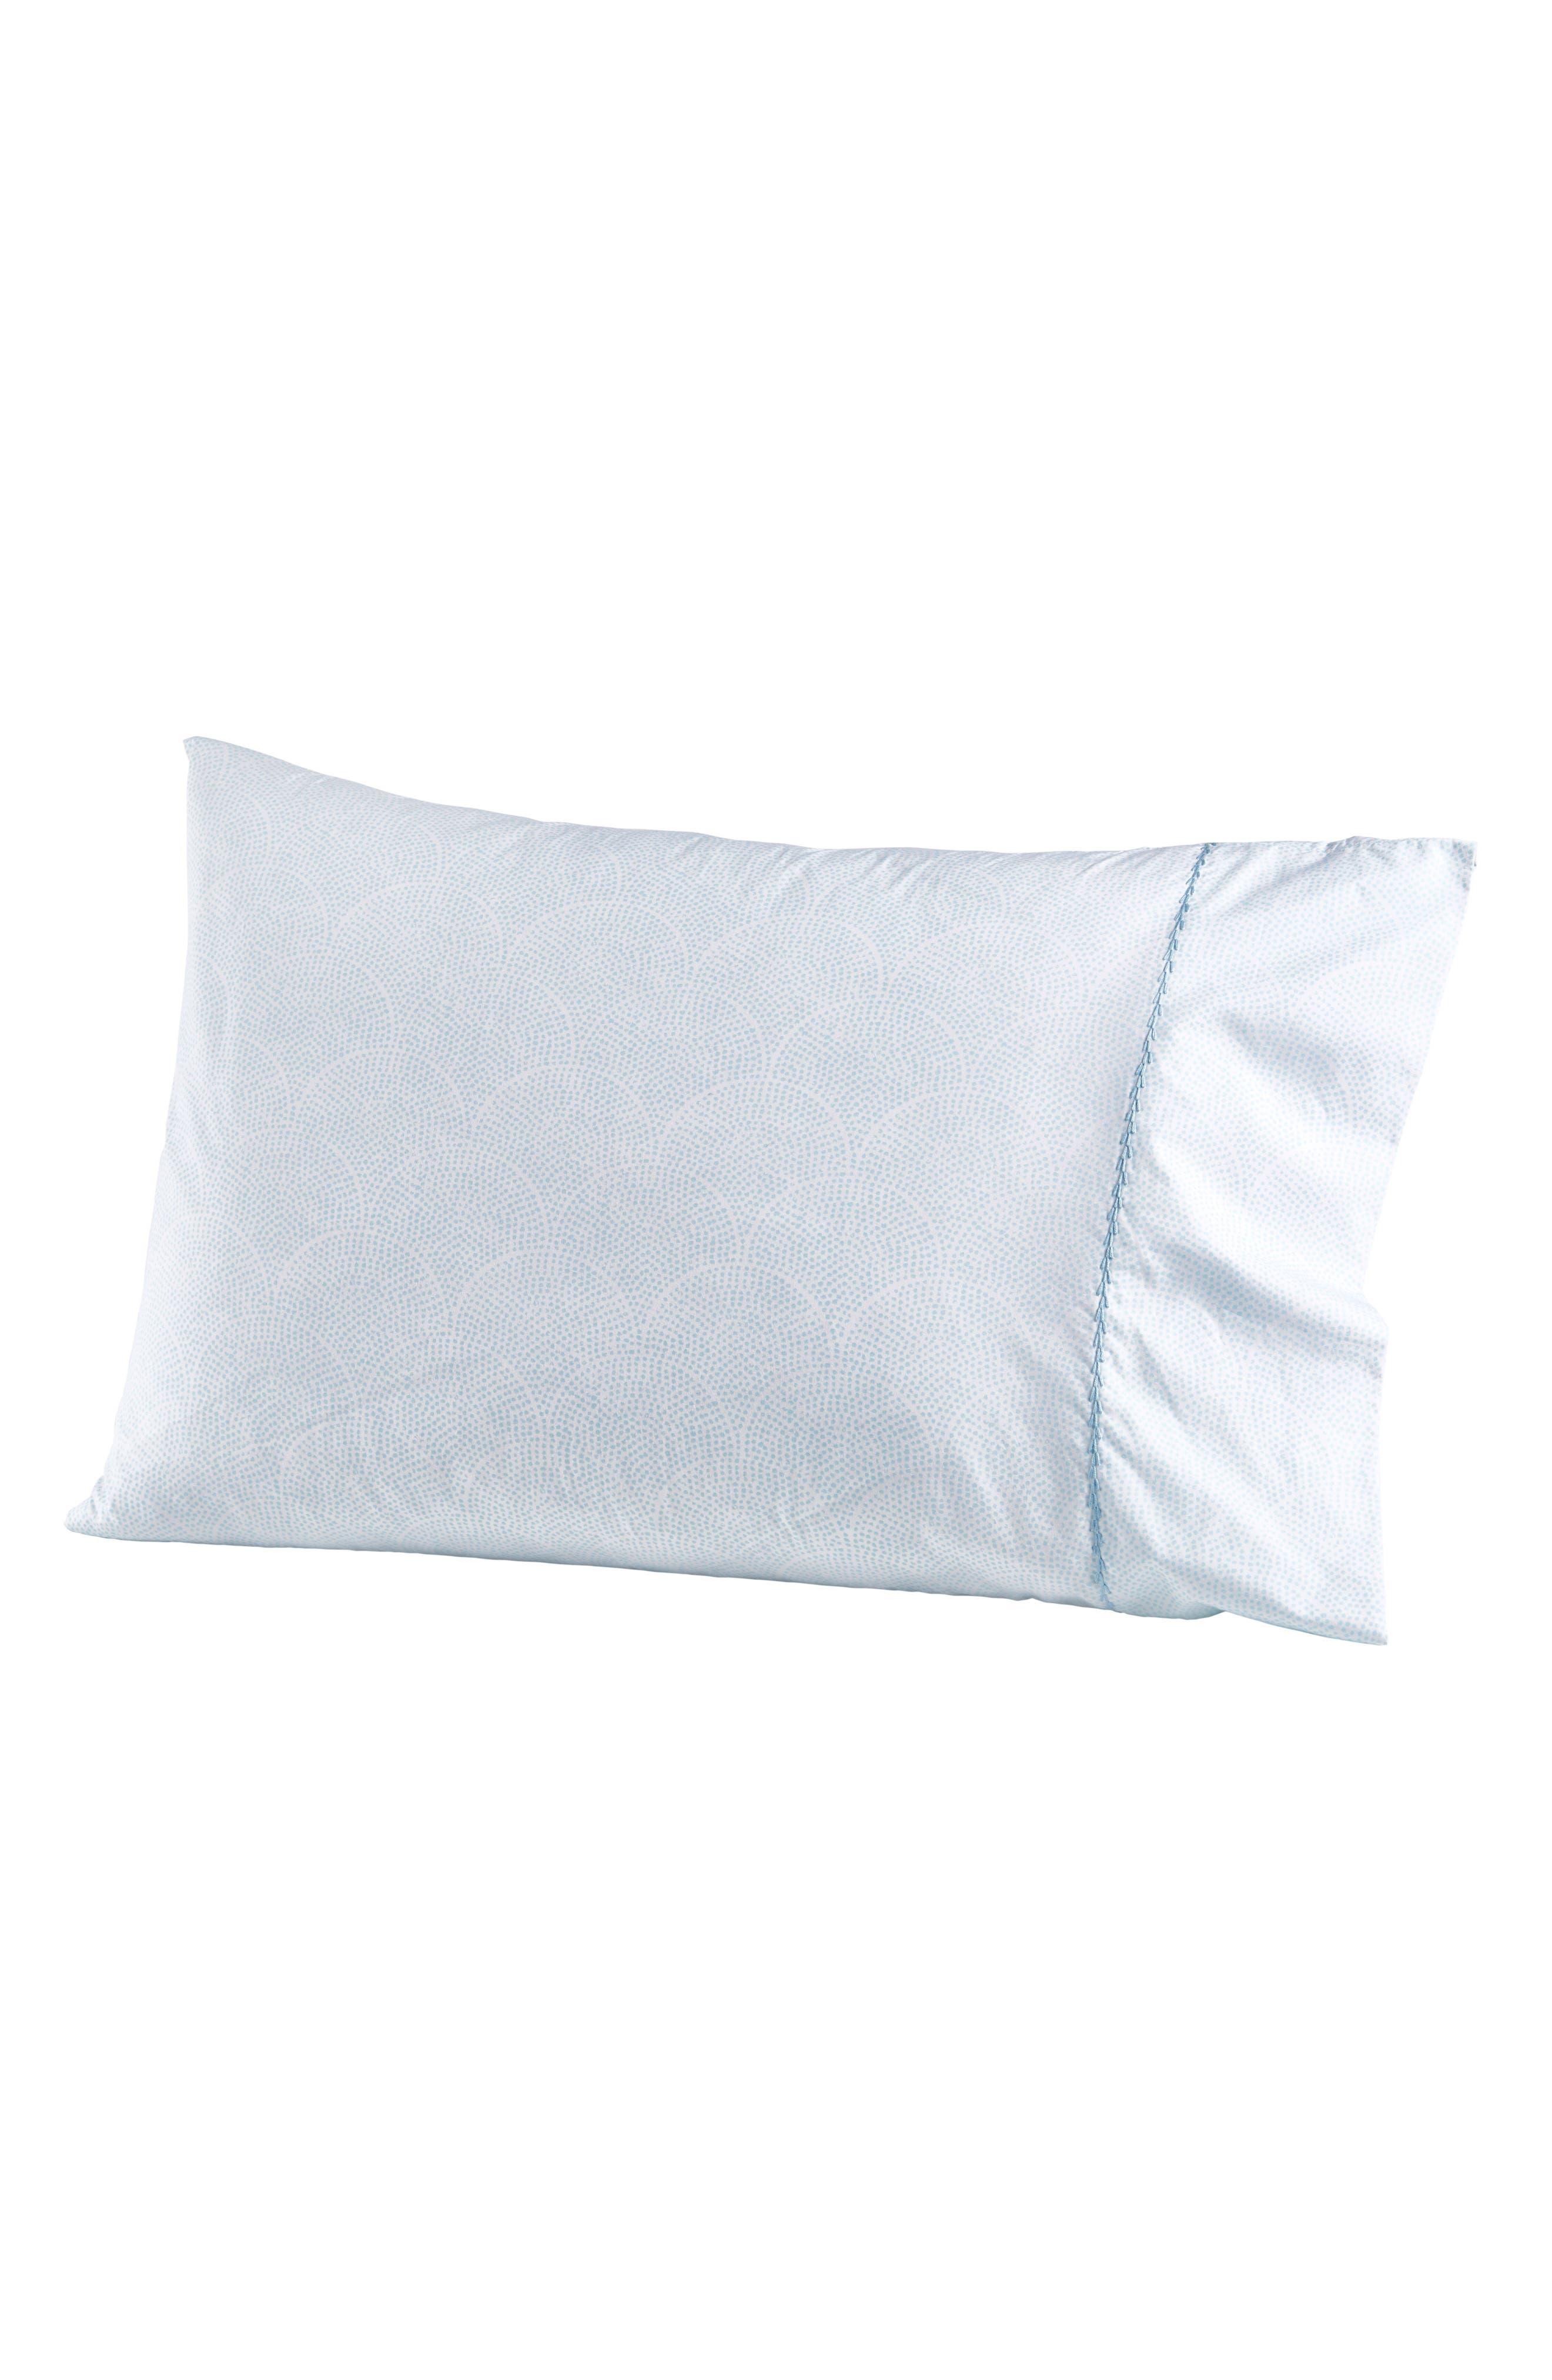 Alternate Image 1 Selected - John Robshaw Vatula 400 Thread Count Pillowcases